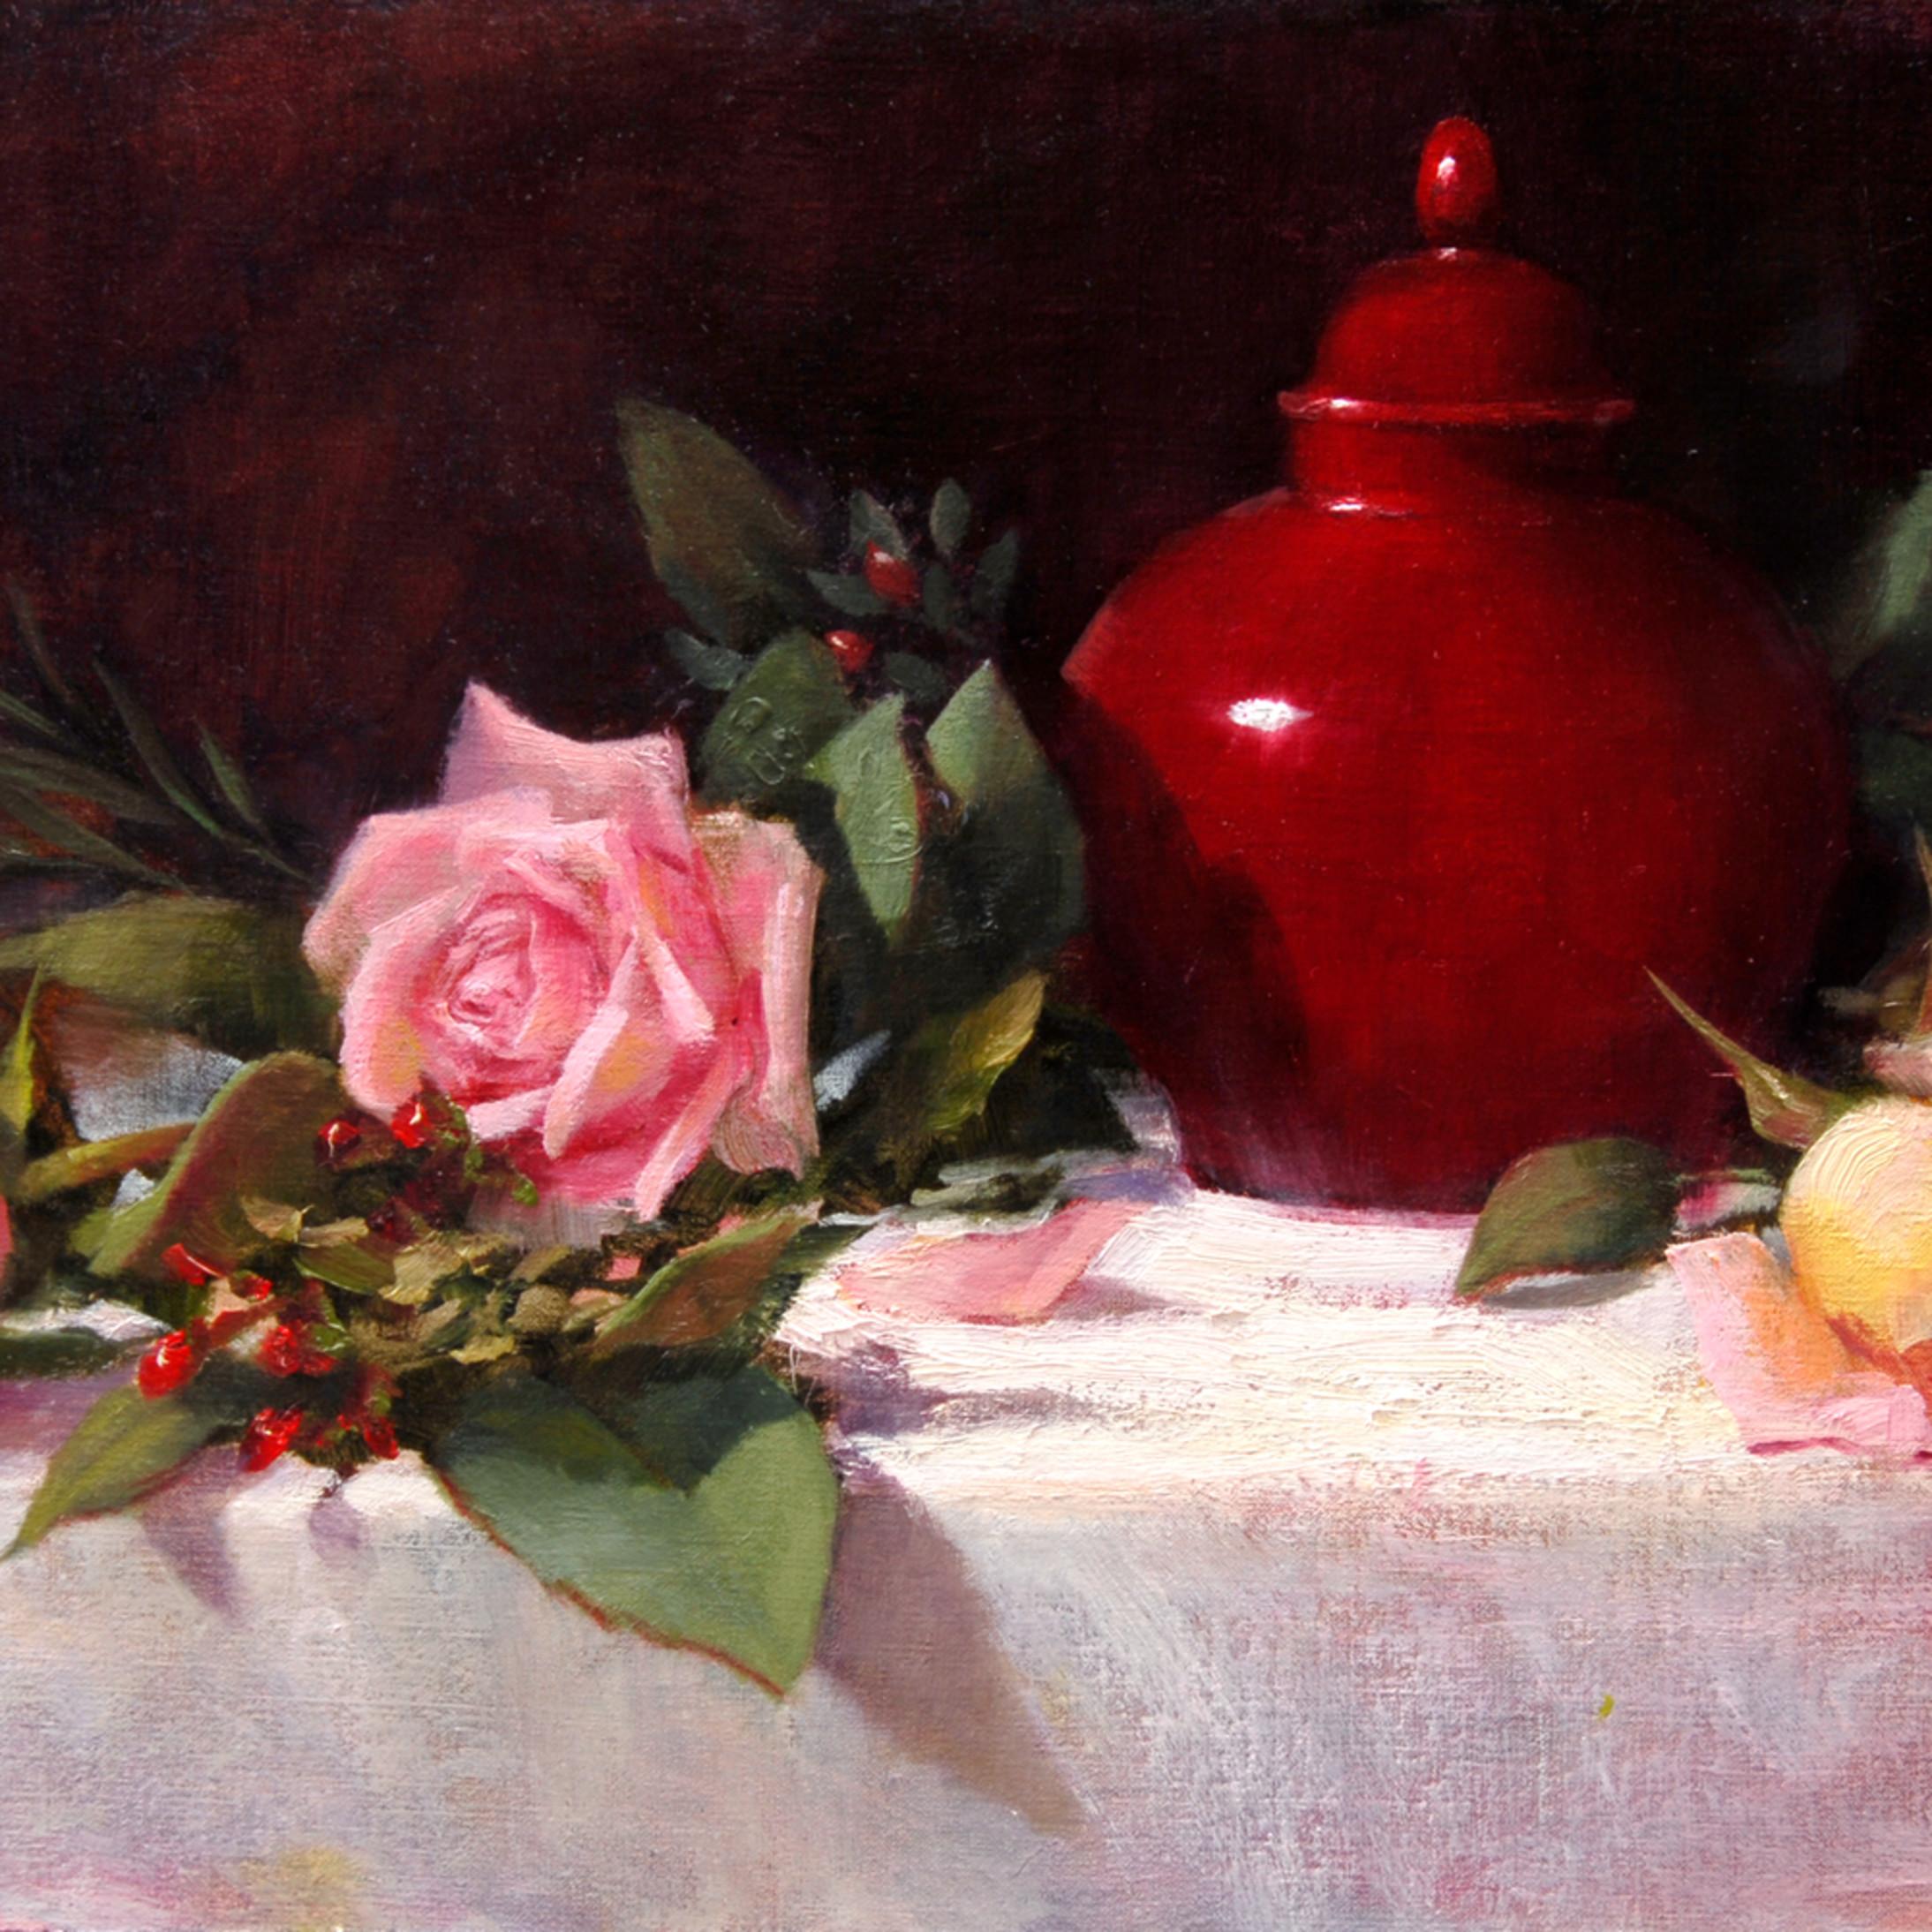 Roses and ginger jar xroabm